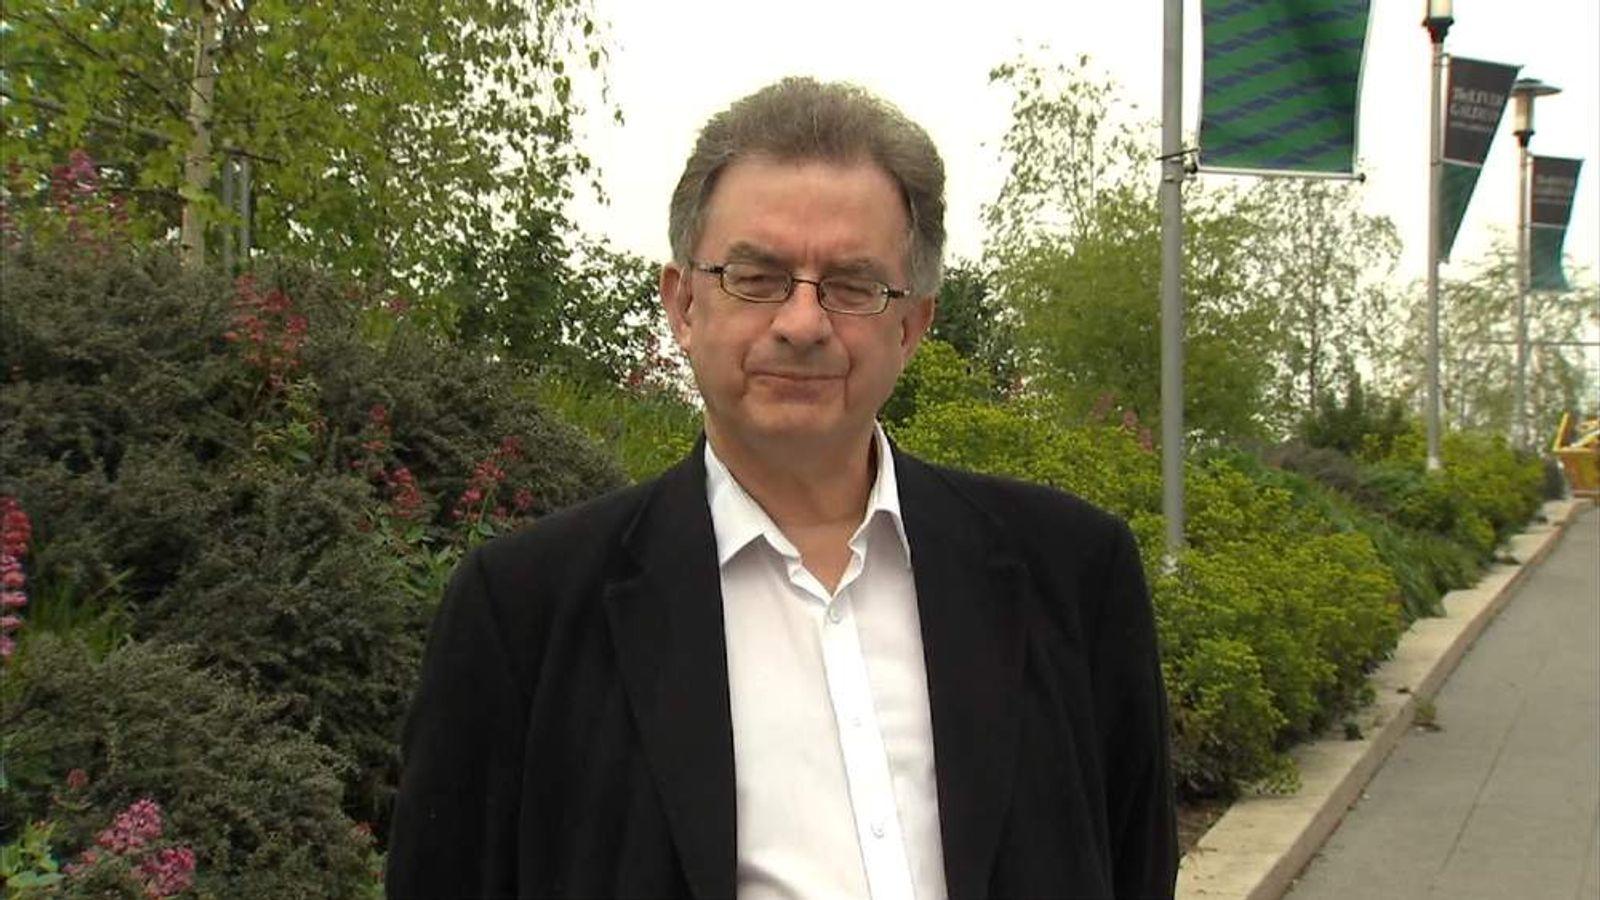 Professor Chris French